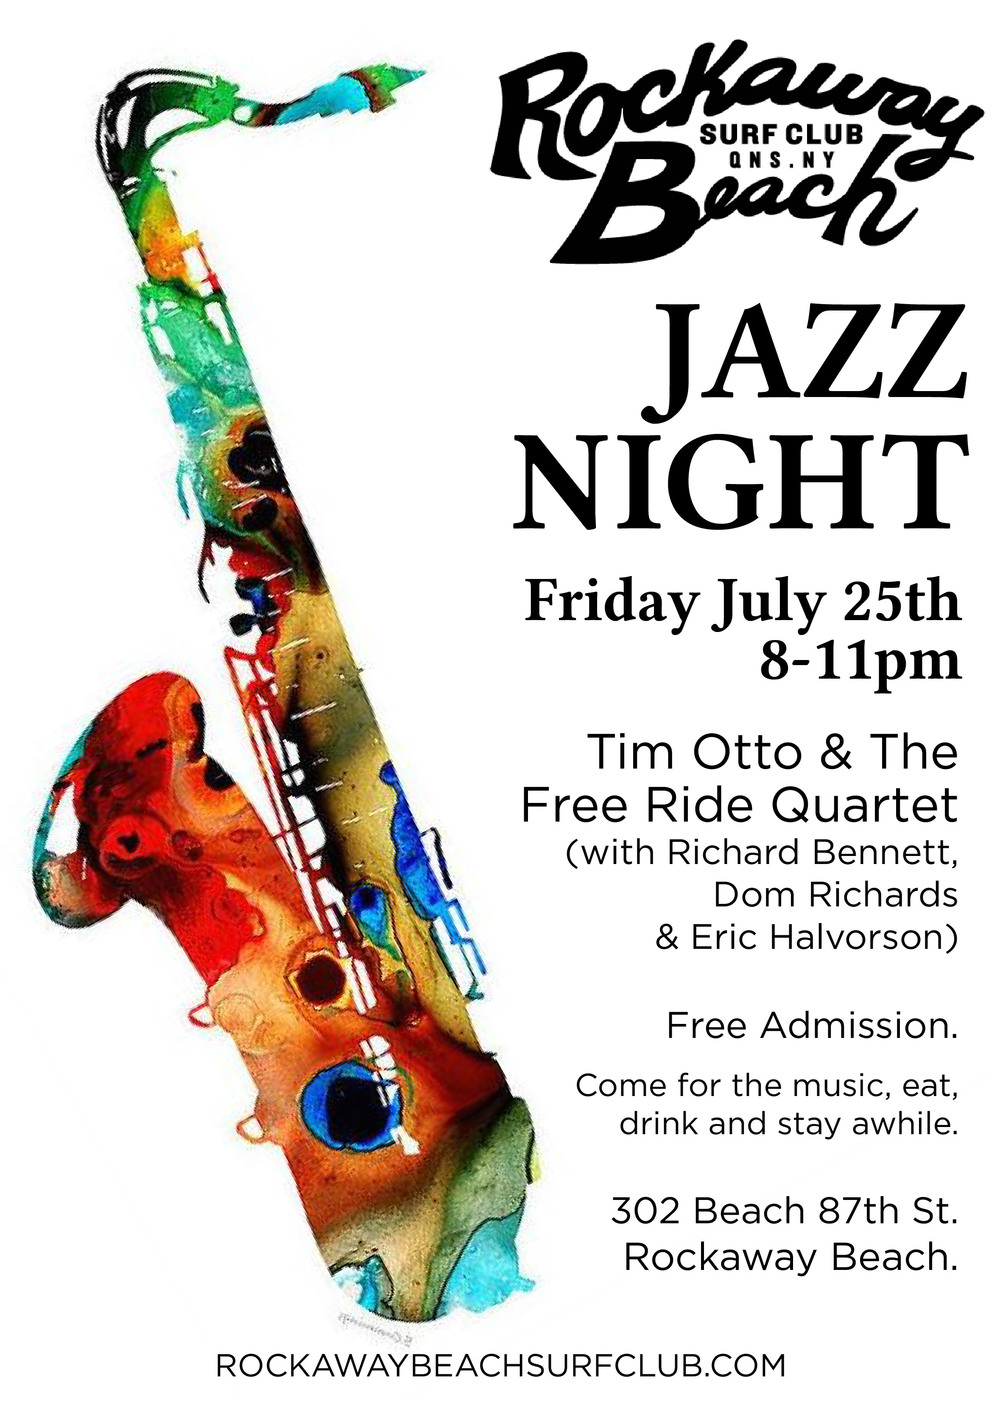 RBSC Jazz Night July 25th v2-01.jpg